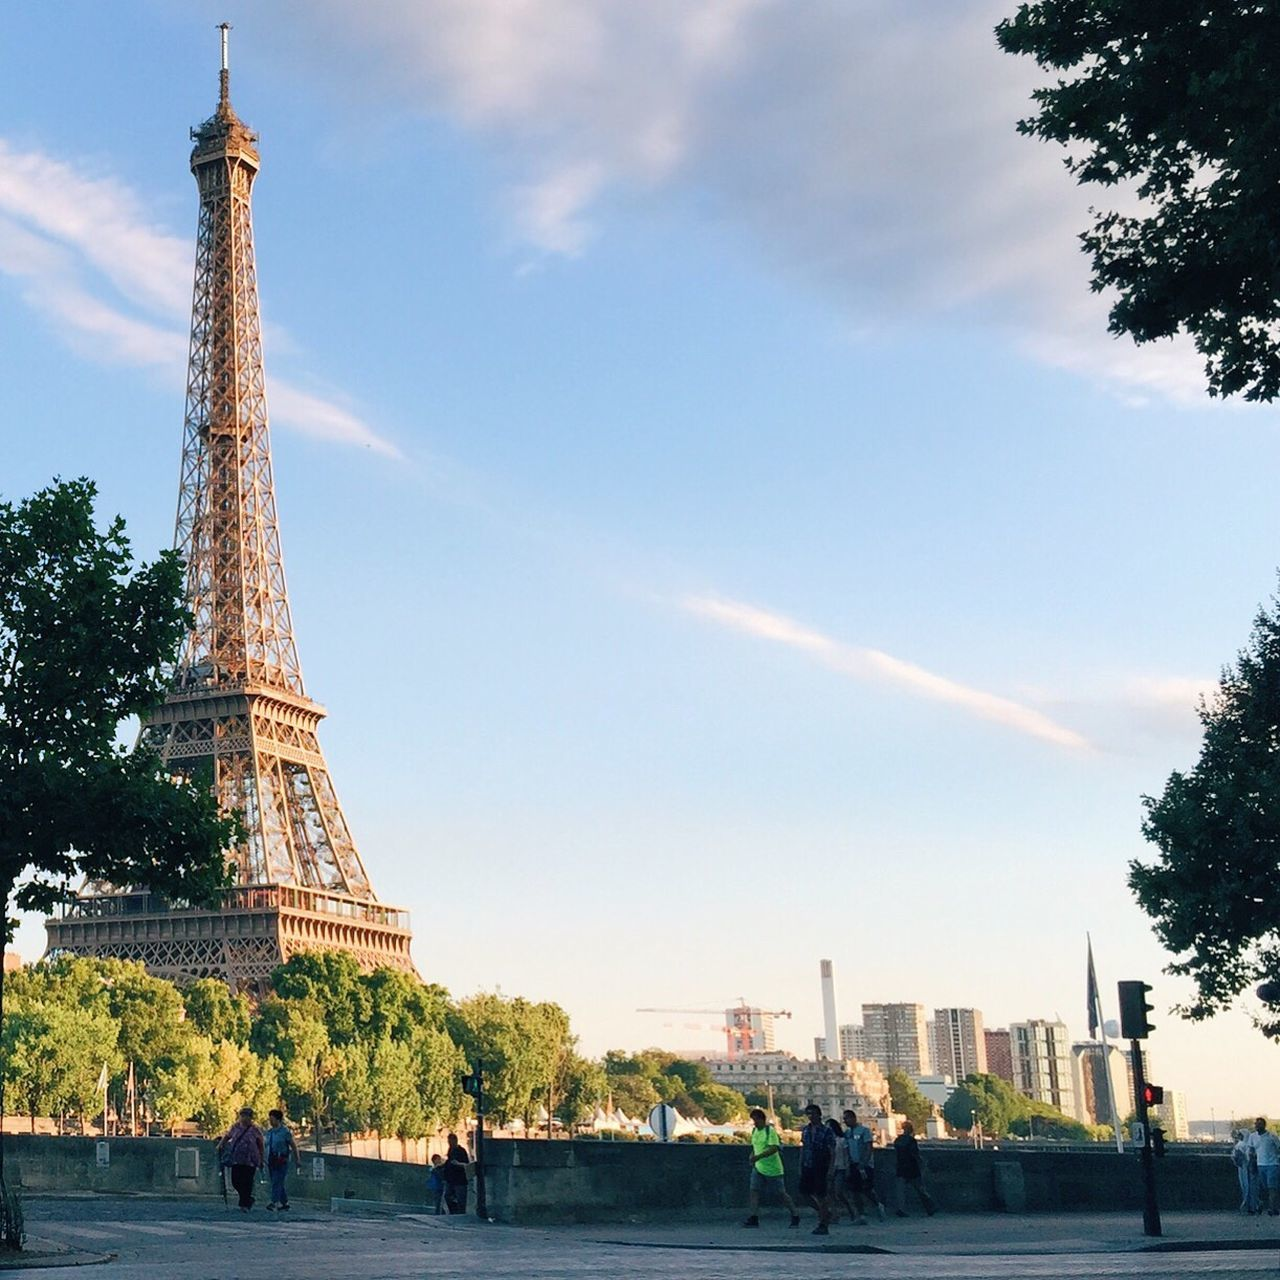 Showcase: November Paris just before the ParisAttacks